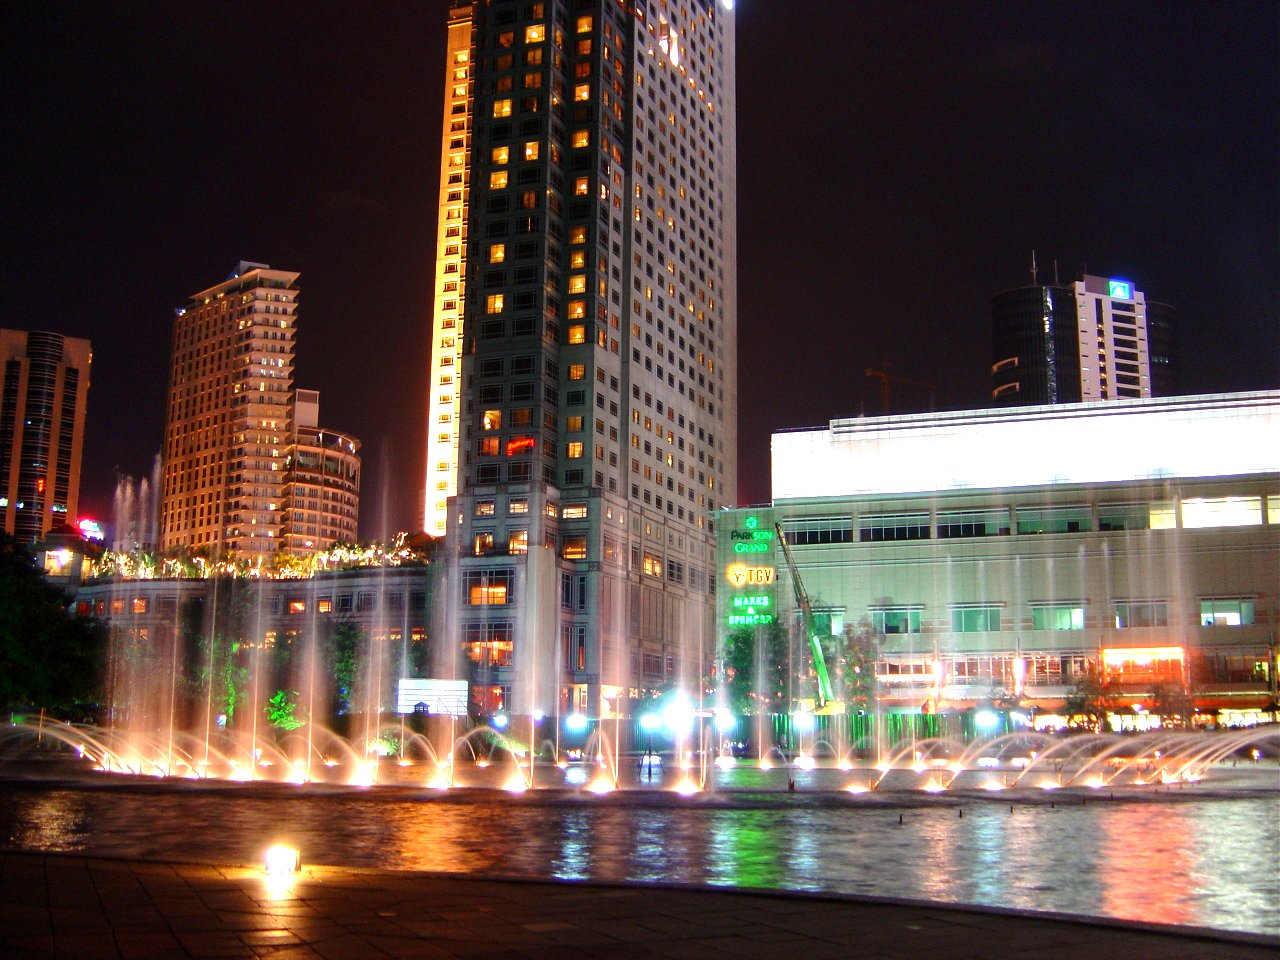 Kuala Lumpur City Centre Park at night